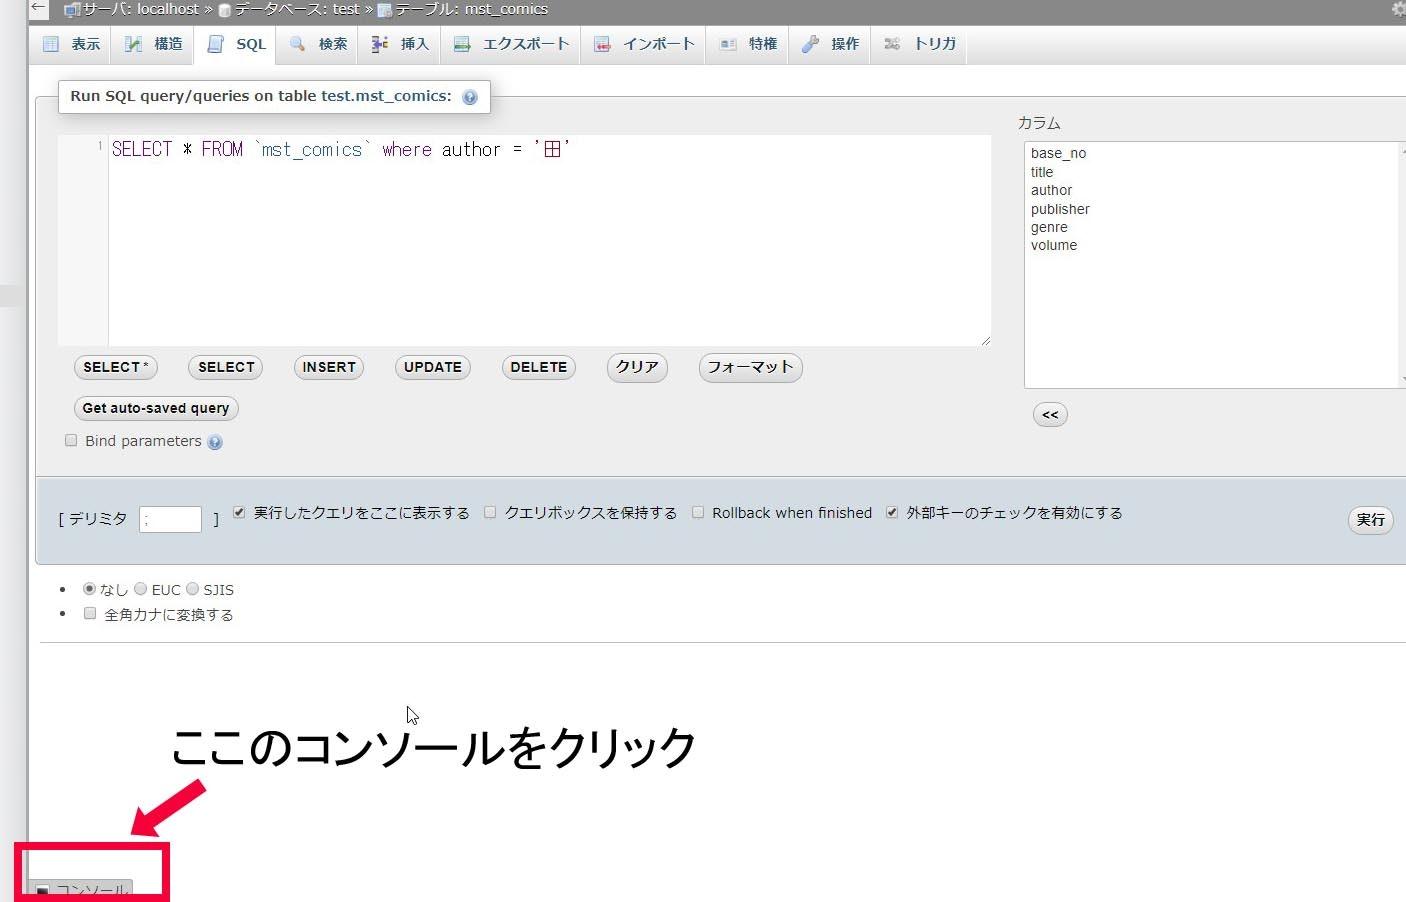 console_sel2.jpg